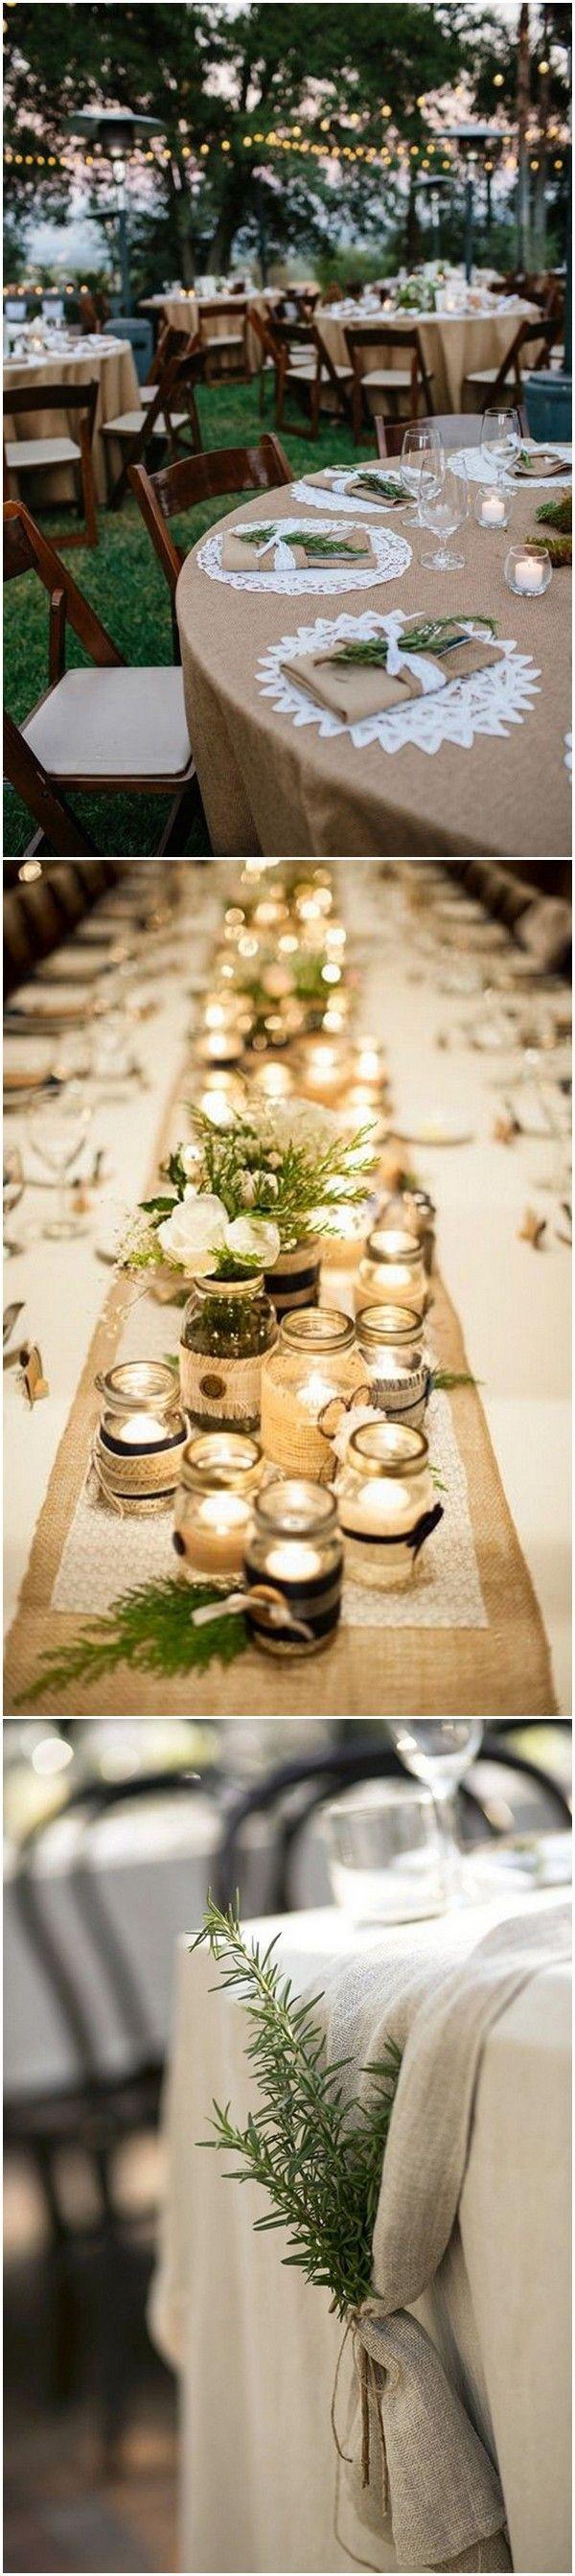 Brilliant Wedding Table Decoration Ideas  Page  of   Burlap